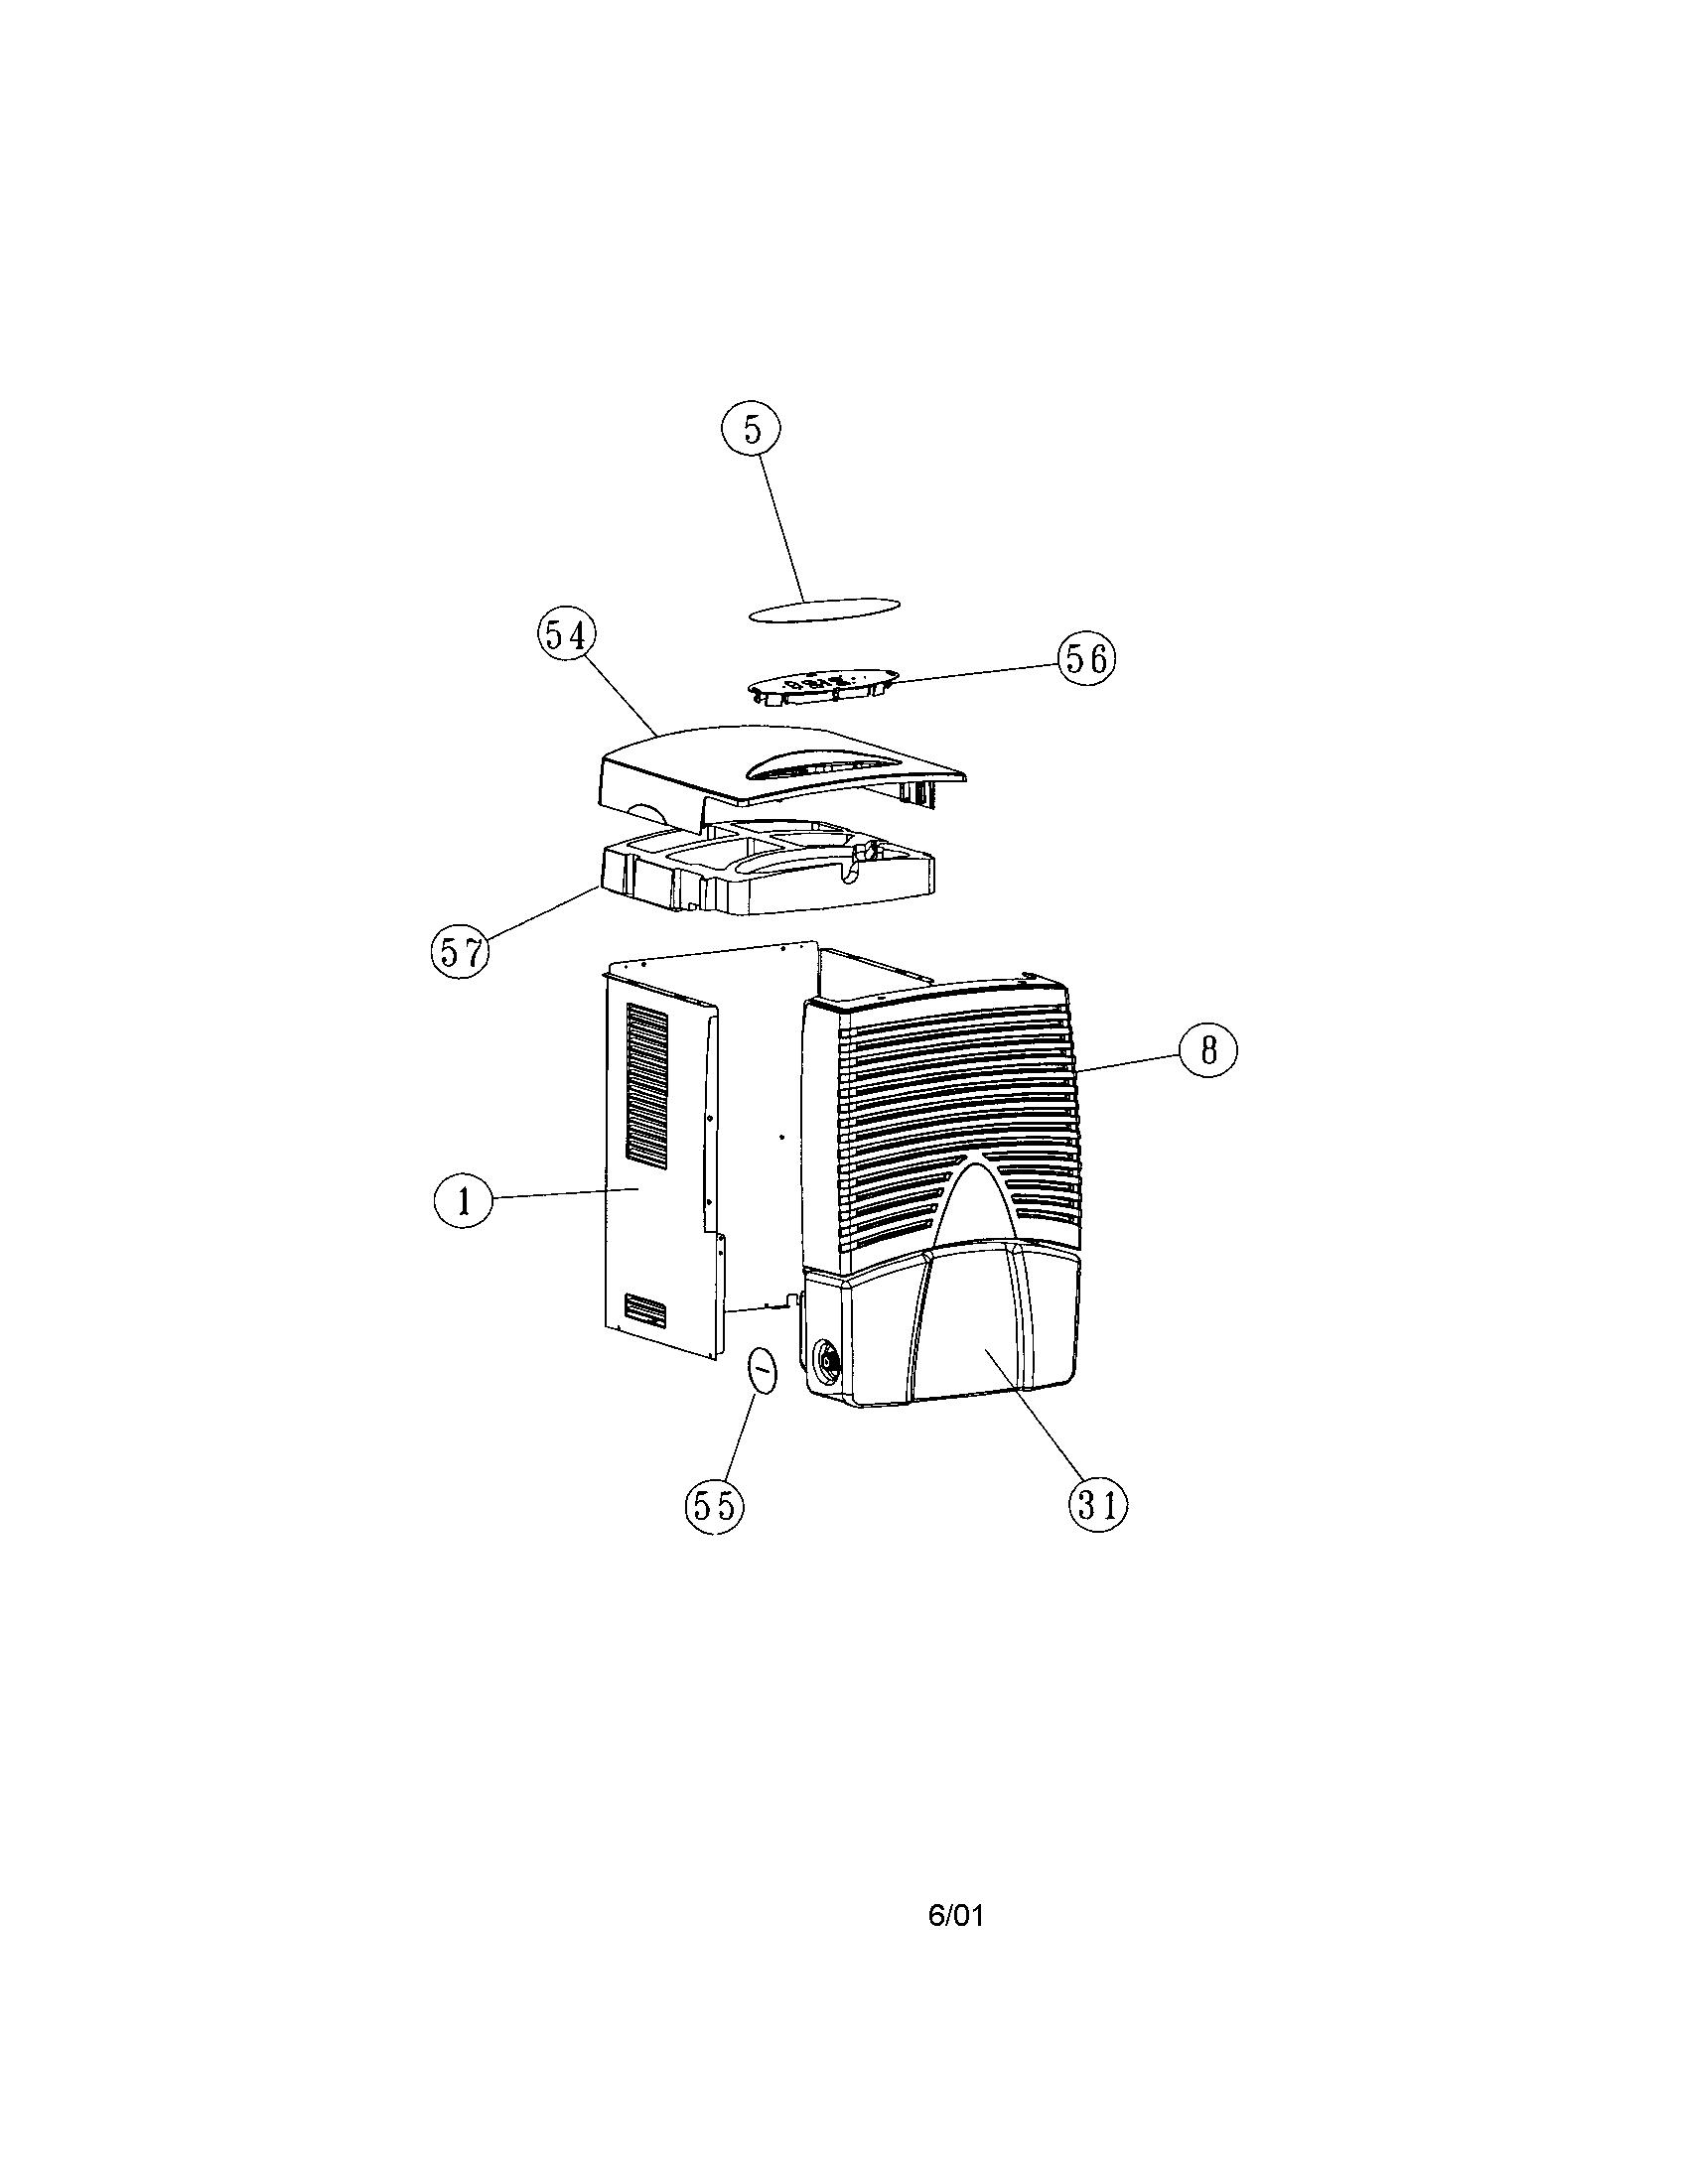 dehumidifier system diagram